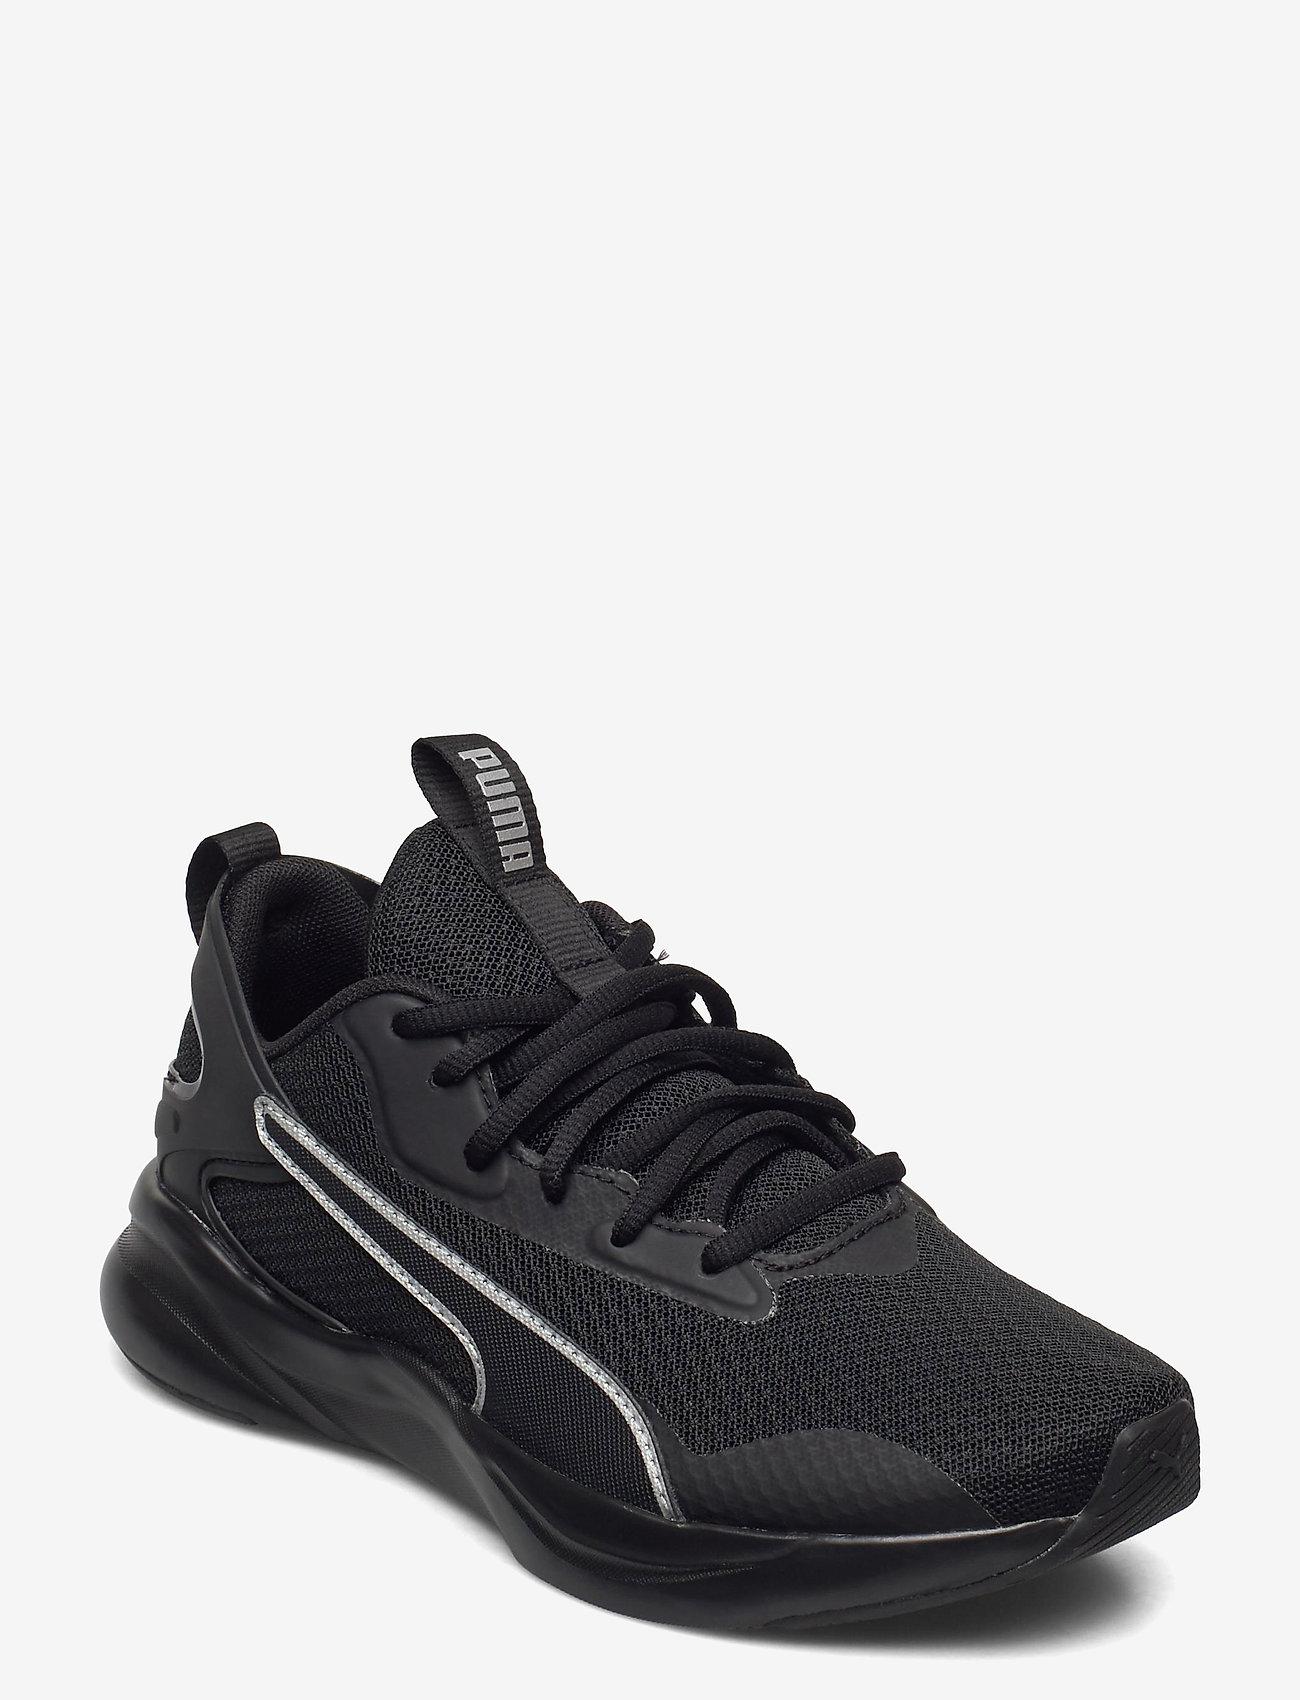 PUMA - SOFTRIDE RIFT Wn's - lage sneakers - puma black-puma black - 0